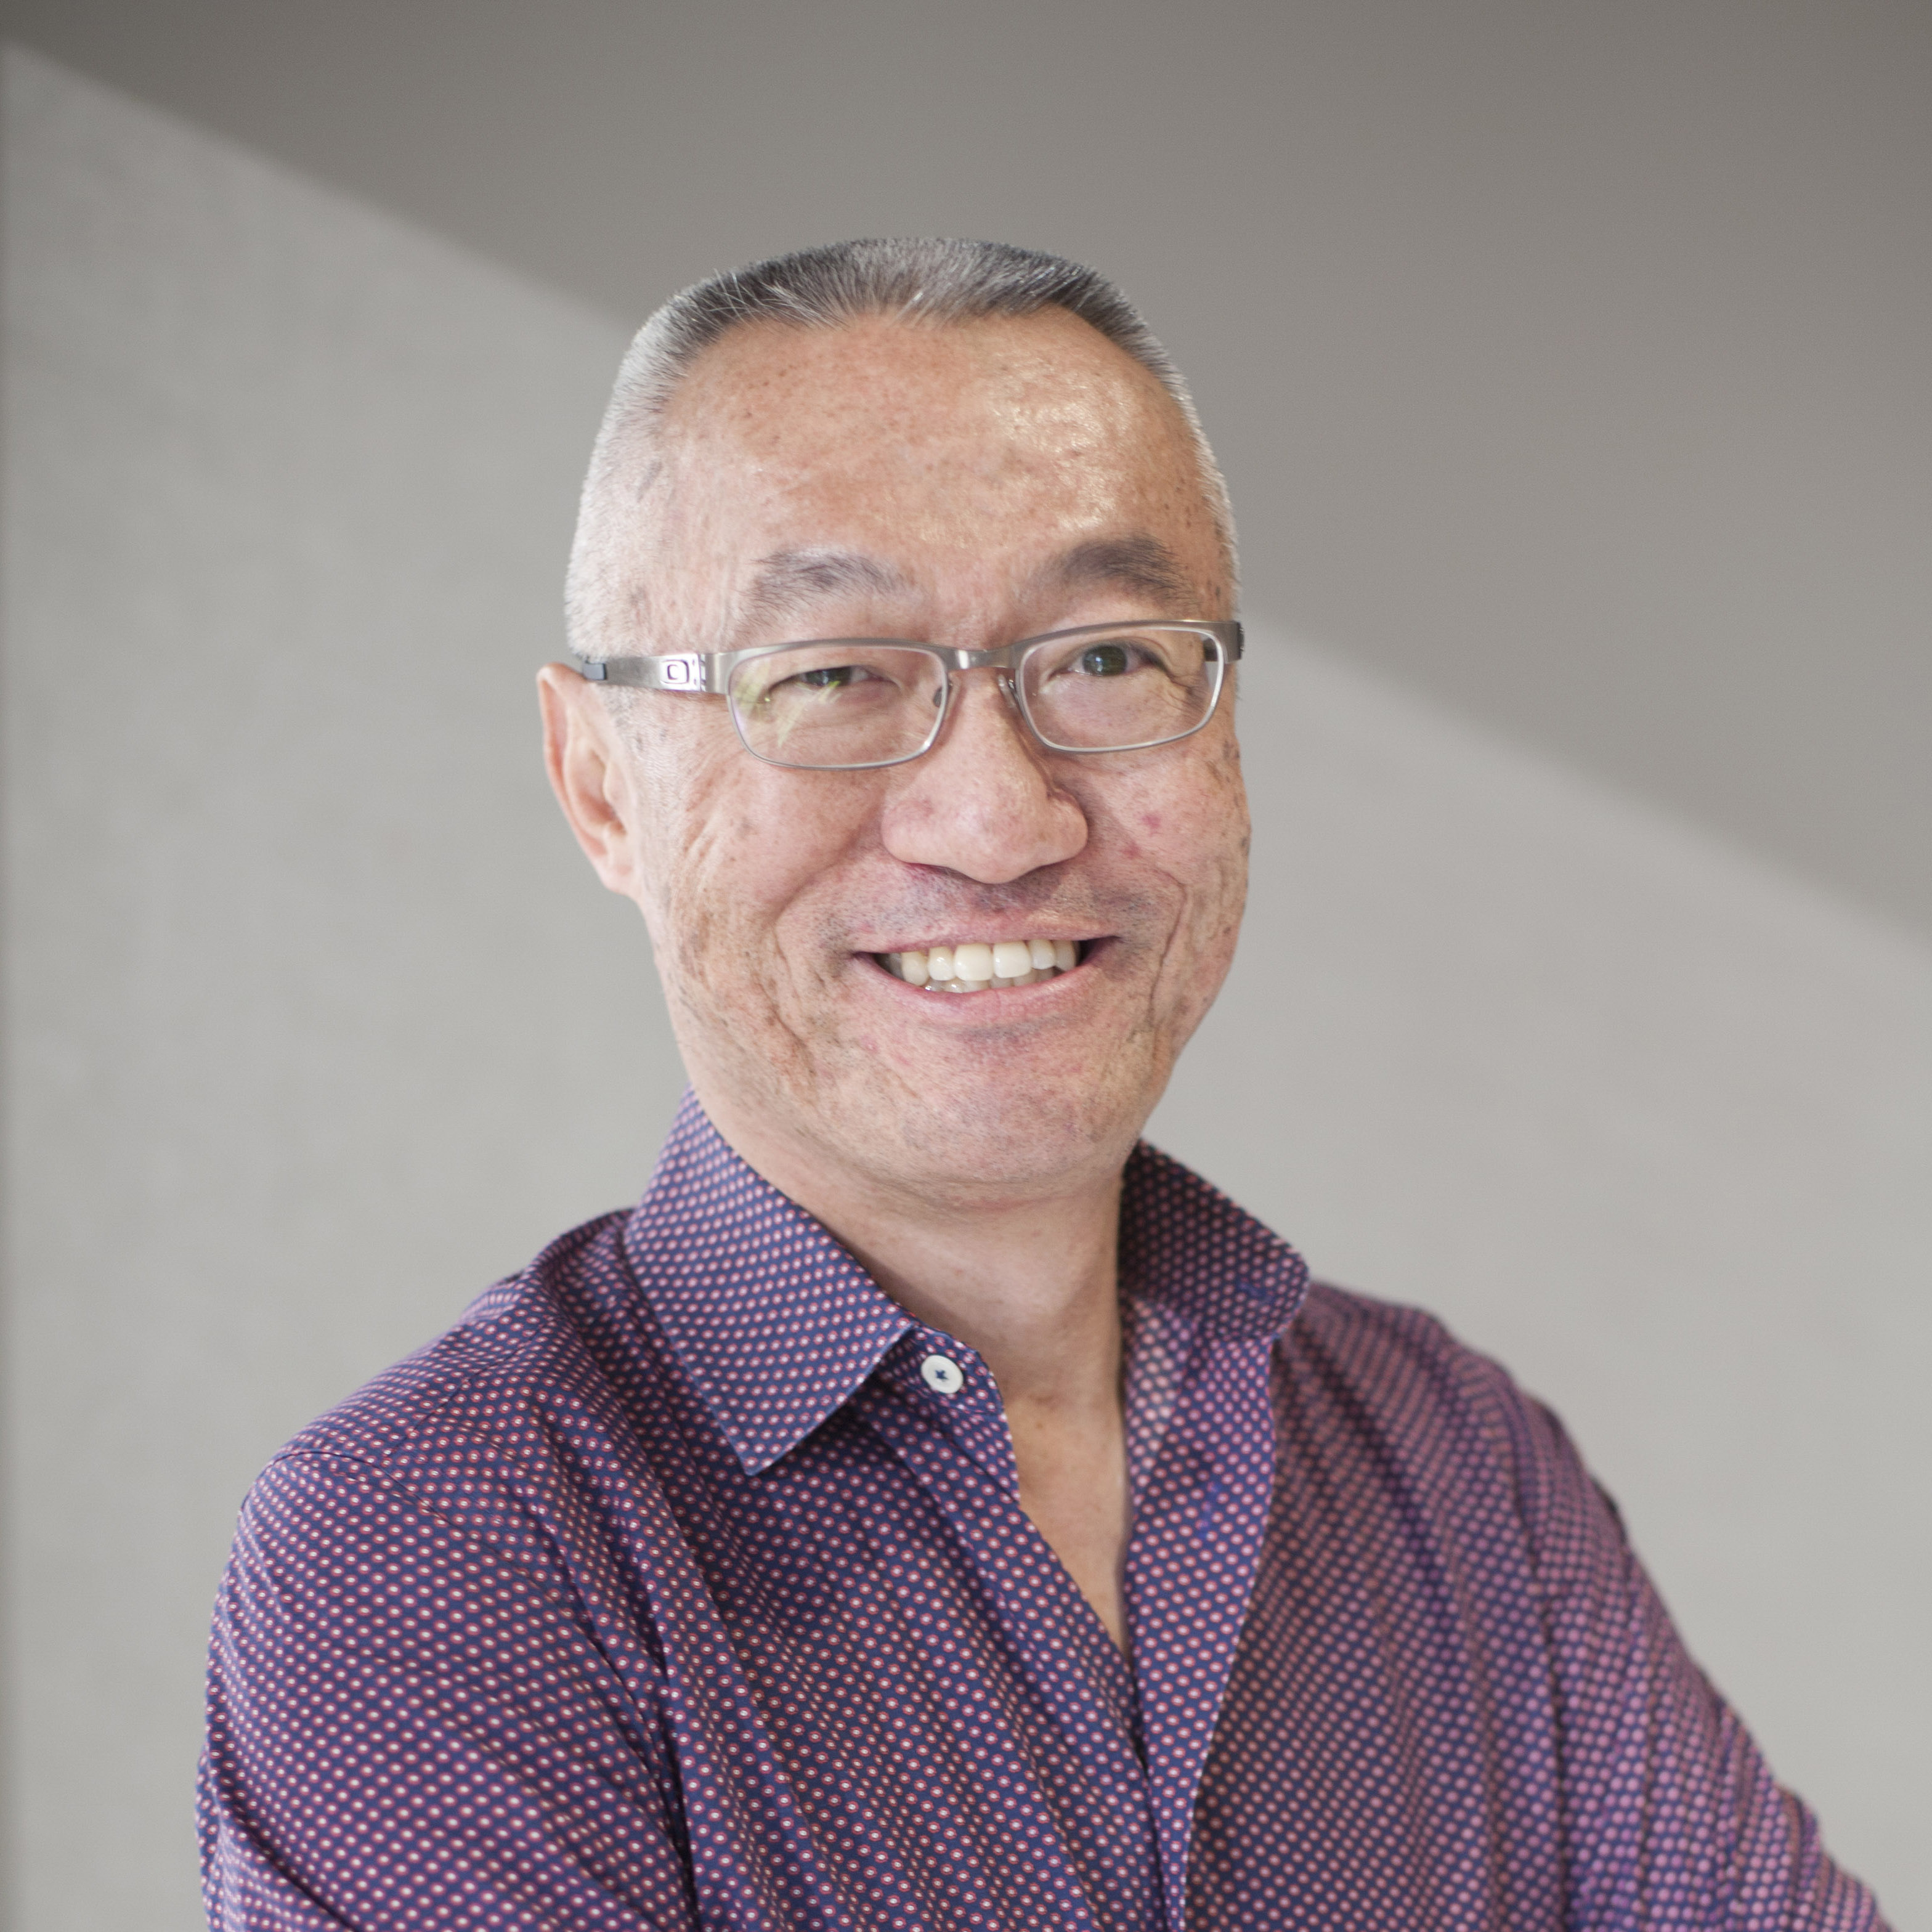 Dr. Rick Hu